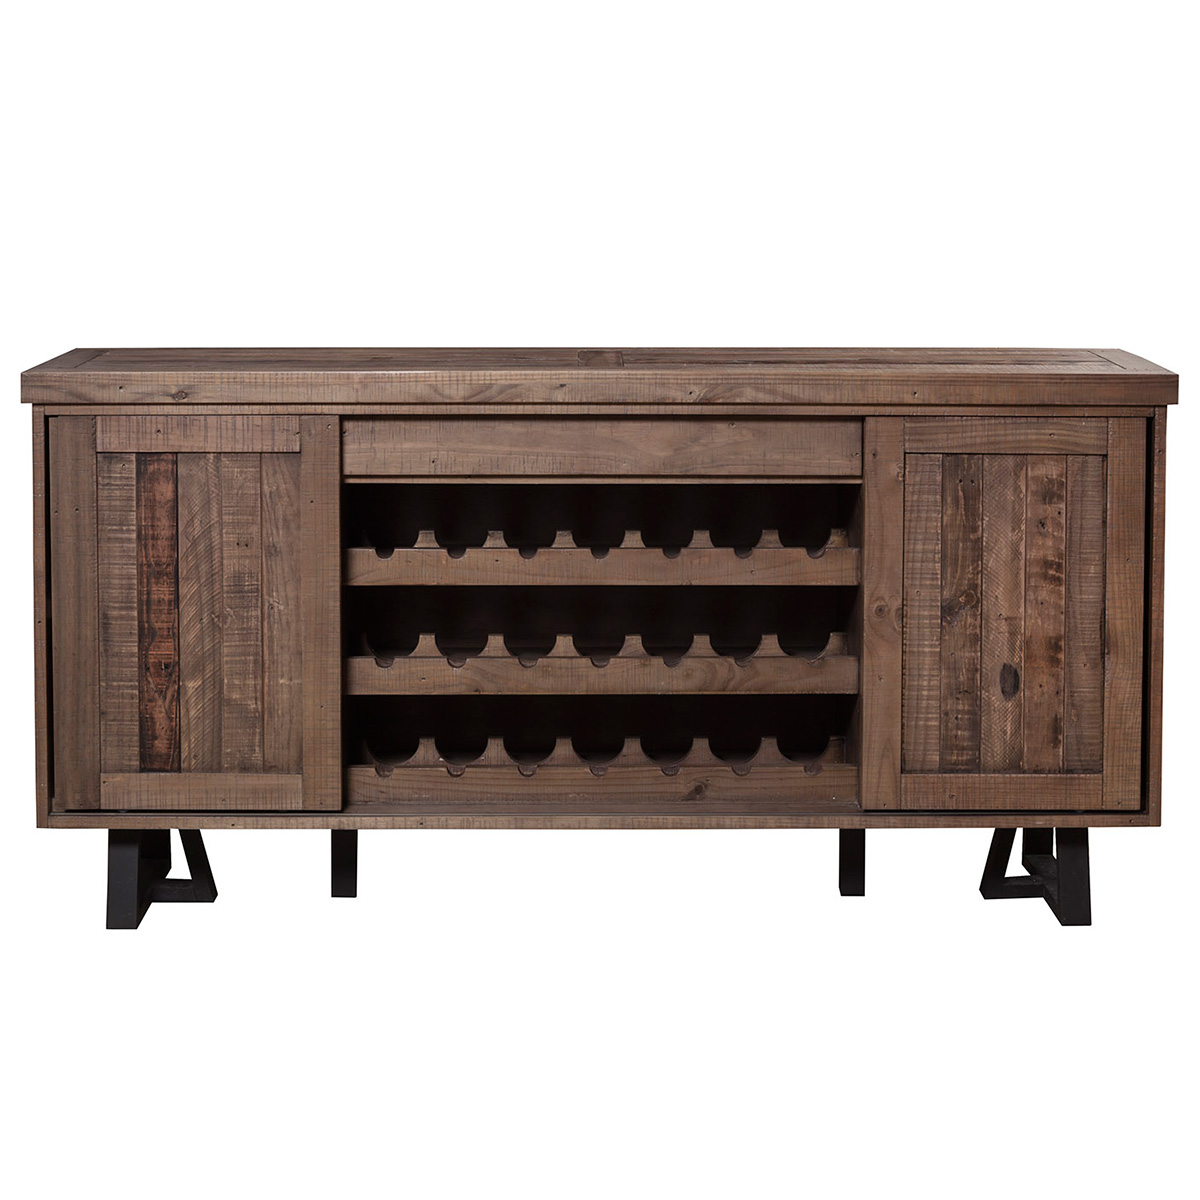 Alpine furniture 1568 06 prairie sideboard w wine holder prairie sideboard w wine holder sliding doors in reclaimed natural on black base vtopaller Gallery